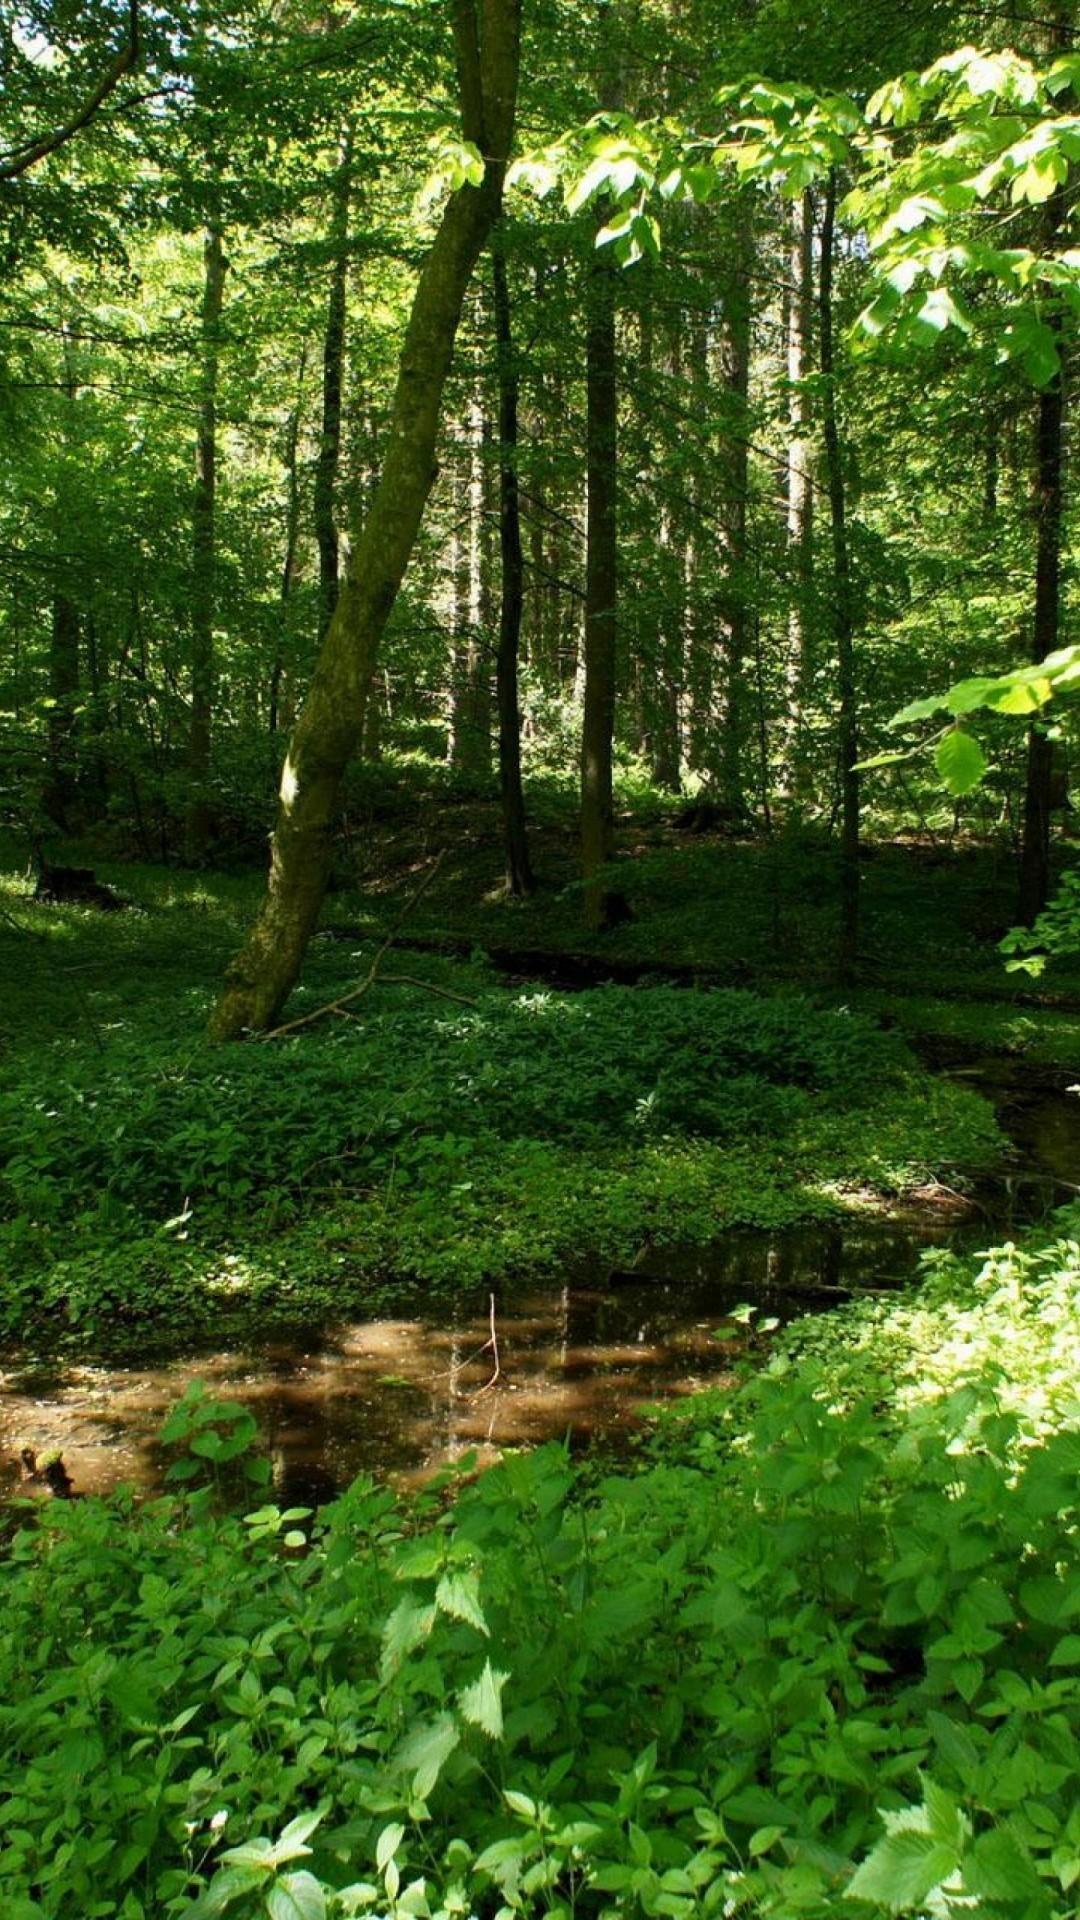 Must see Wallpaper Minecraft Forest - 1061099-download-green-forest-wallpaper-1080x1920  HD_801392.jpg